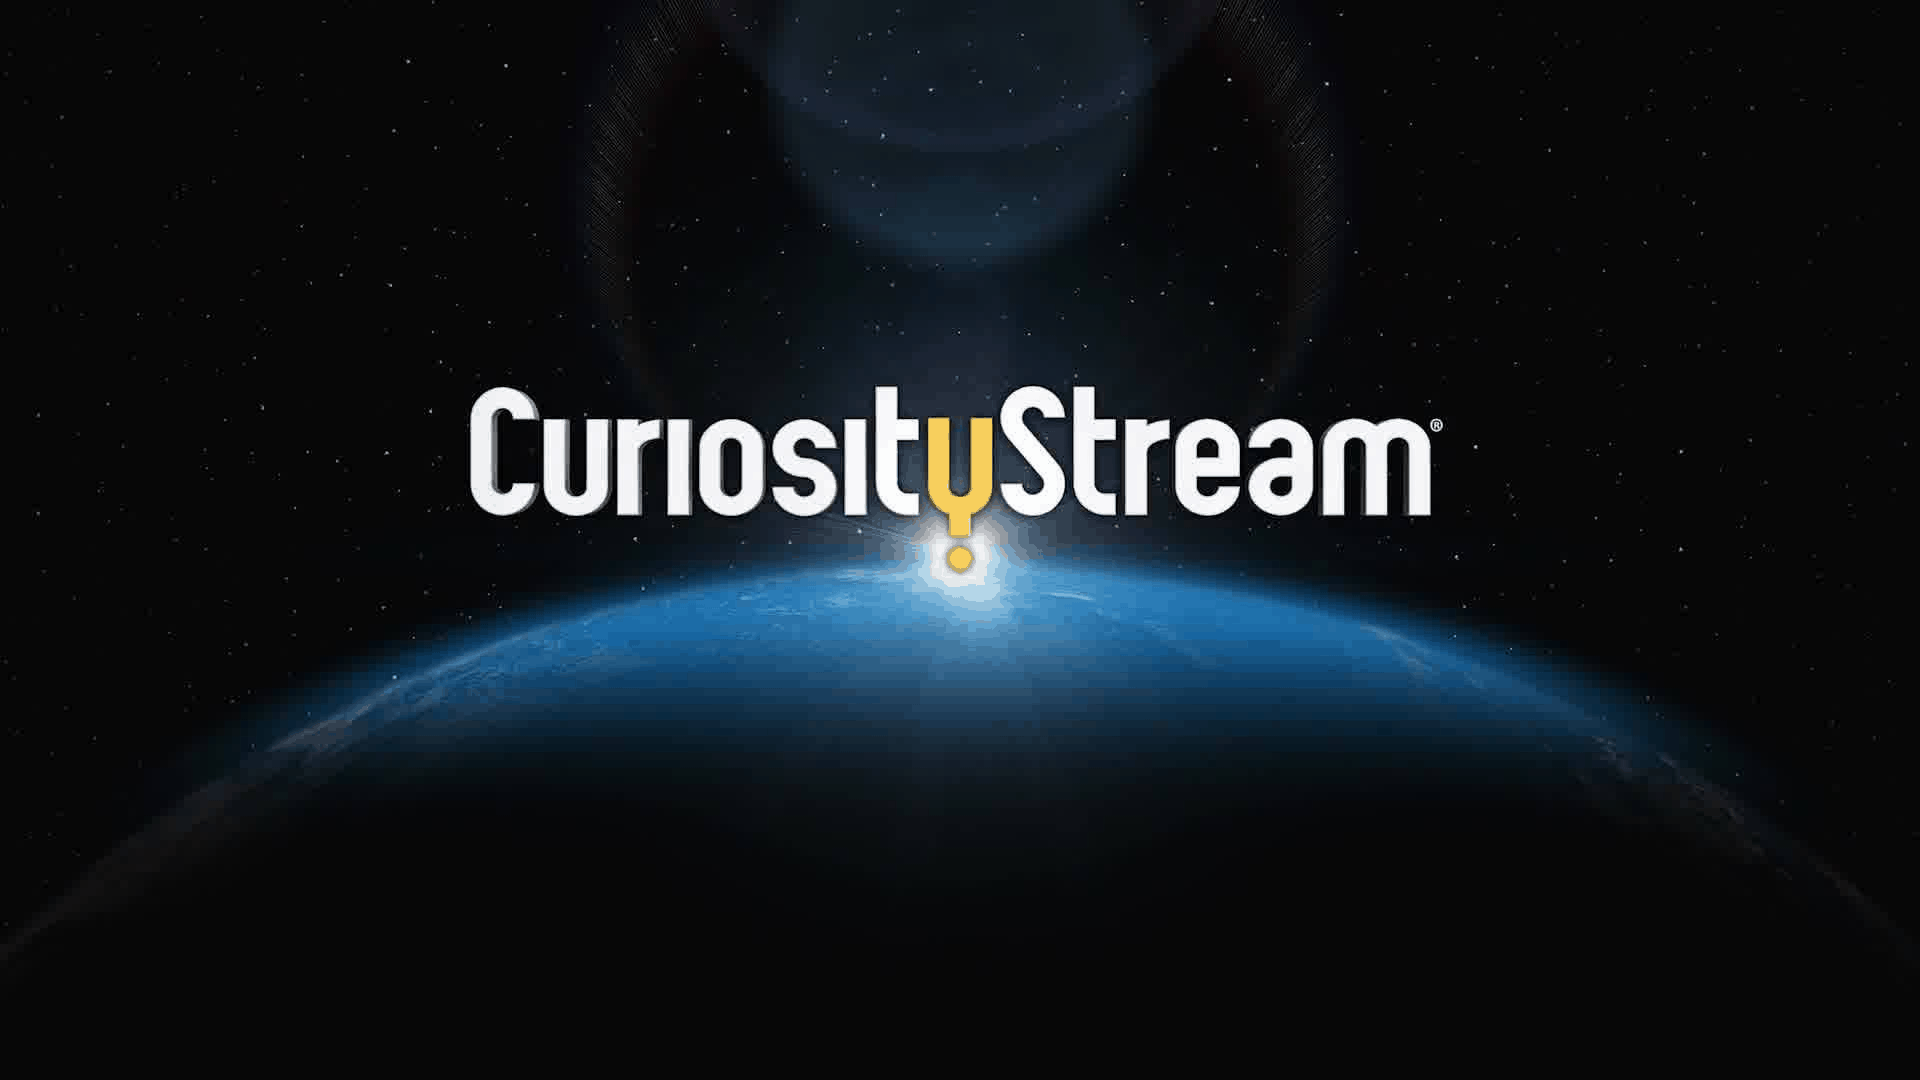 Curiositystream Coupon Get 40 Off Hello Subscription